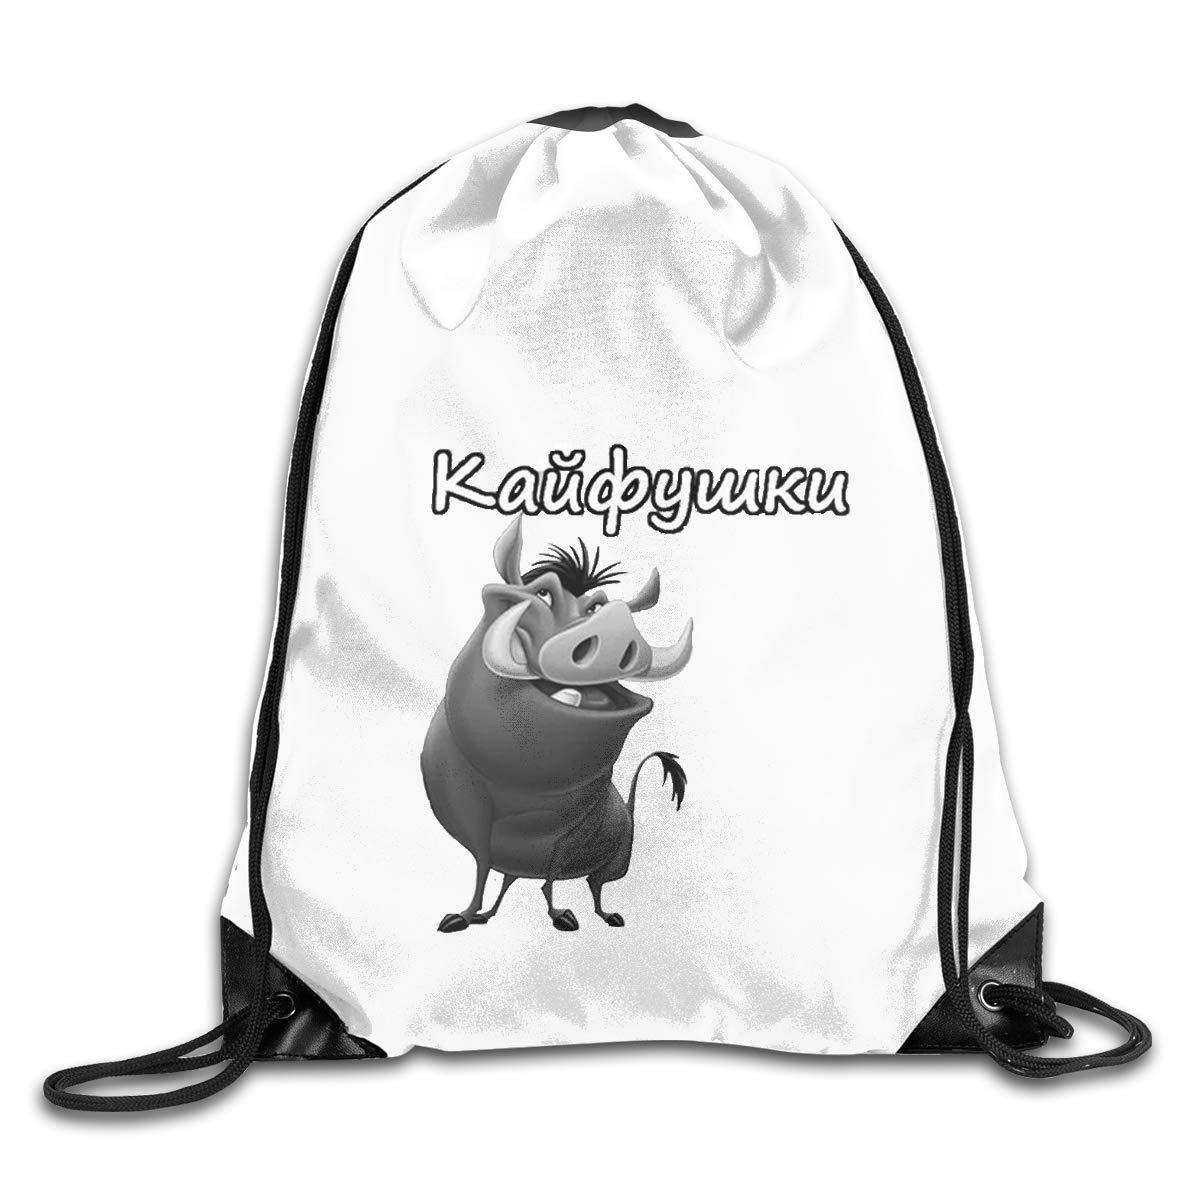 Hakuna Matata Drawstring Bags Eat Sleep Dance Repeat Beam Mouth Backpack Basketball Tennis Gympack The Lion King